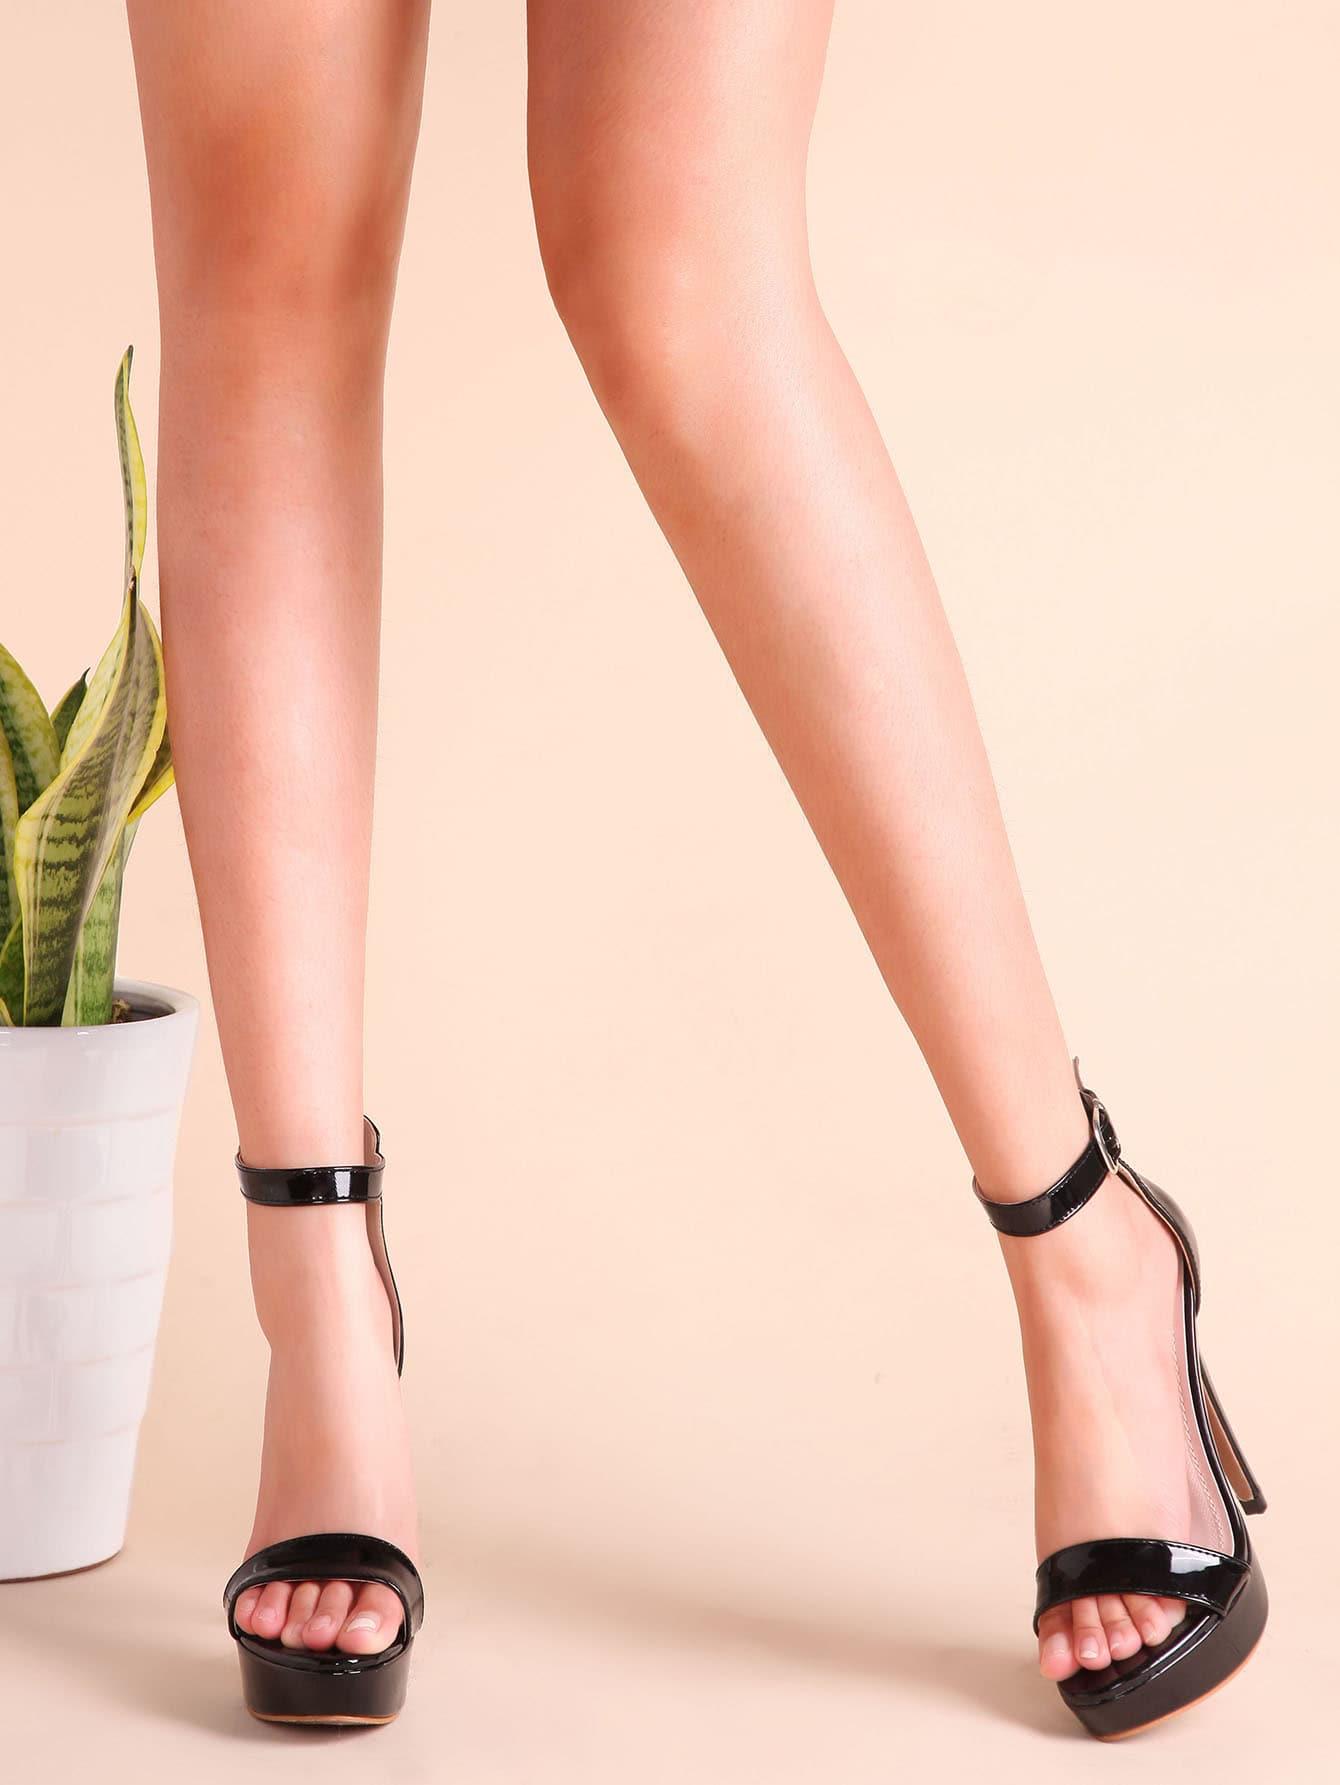 Black Patent Leather Ankle Strap Stiletto Heel Sandals shoes161215804